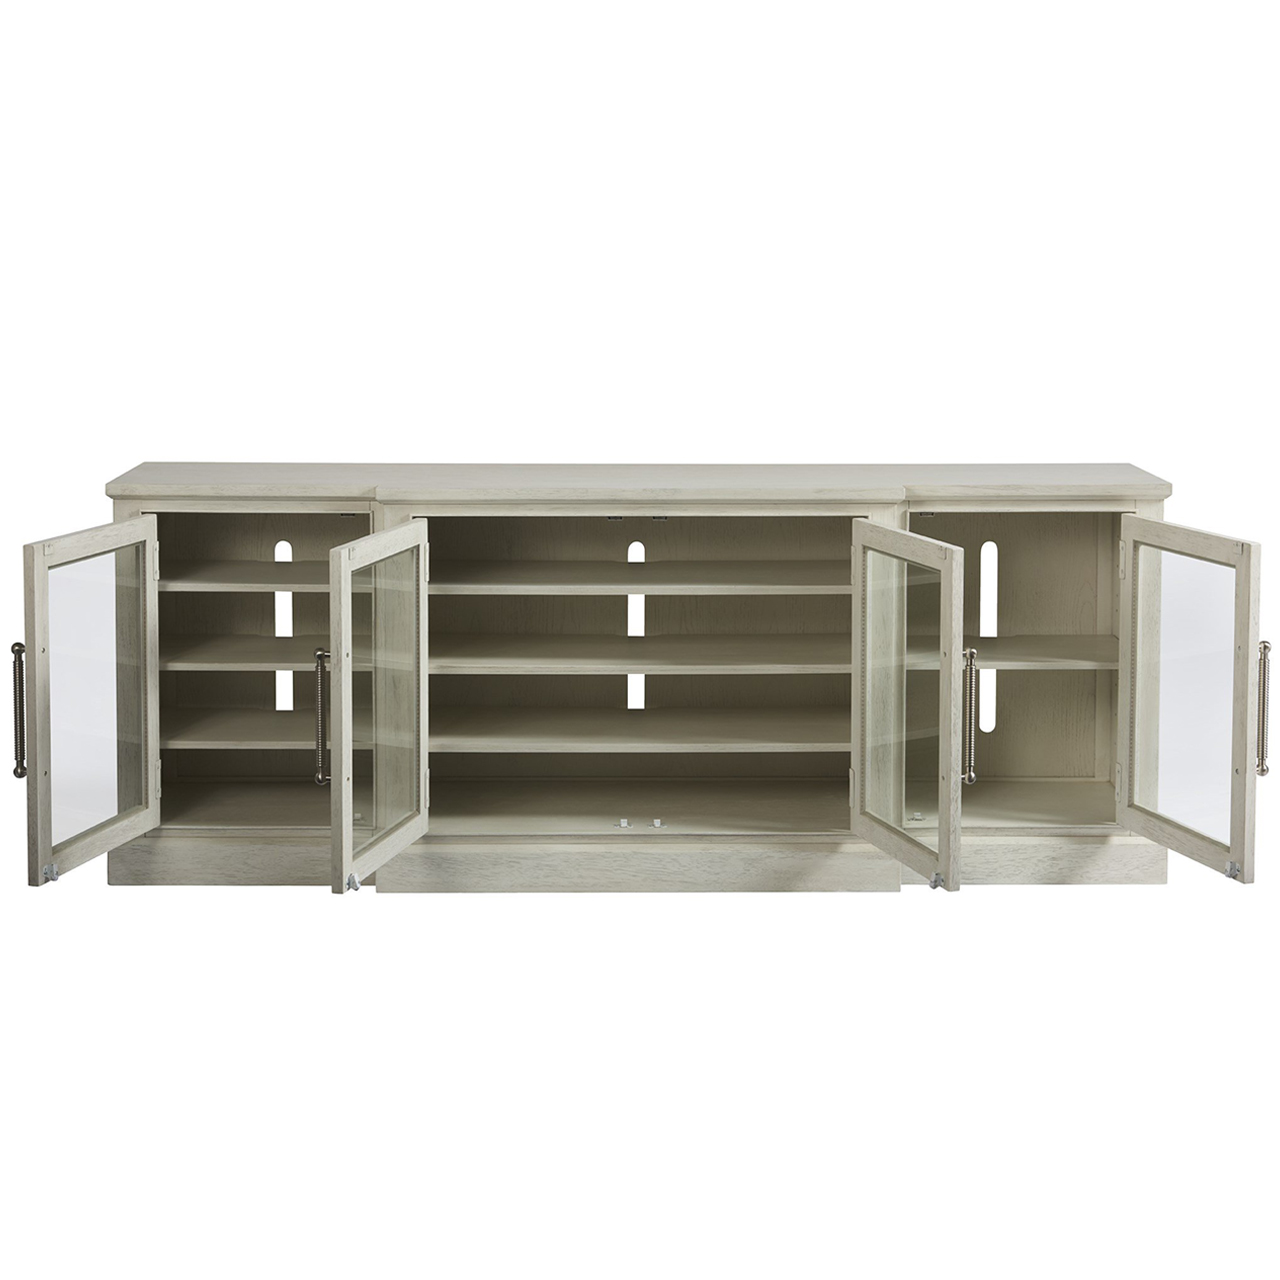 Yareli Coastal Beach White Wood 4 Door Media Cabinet